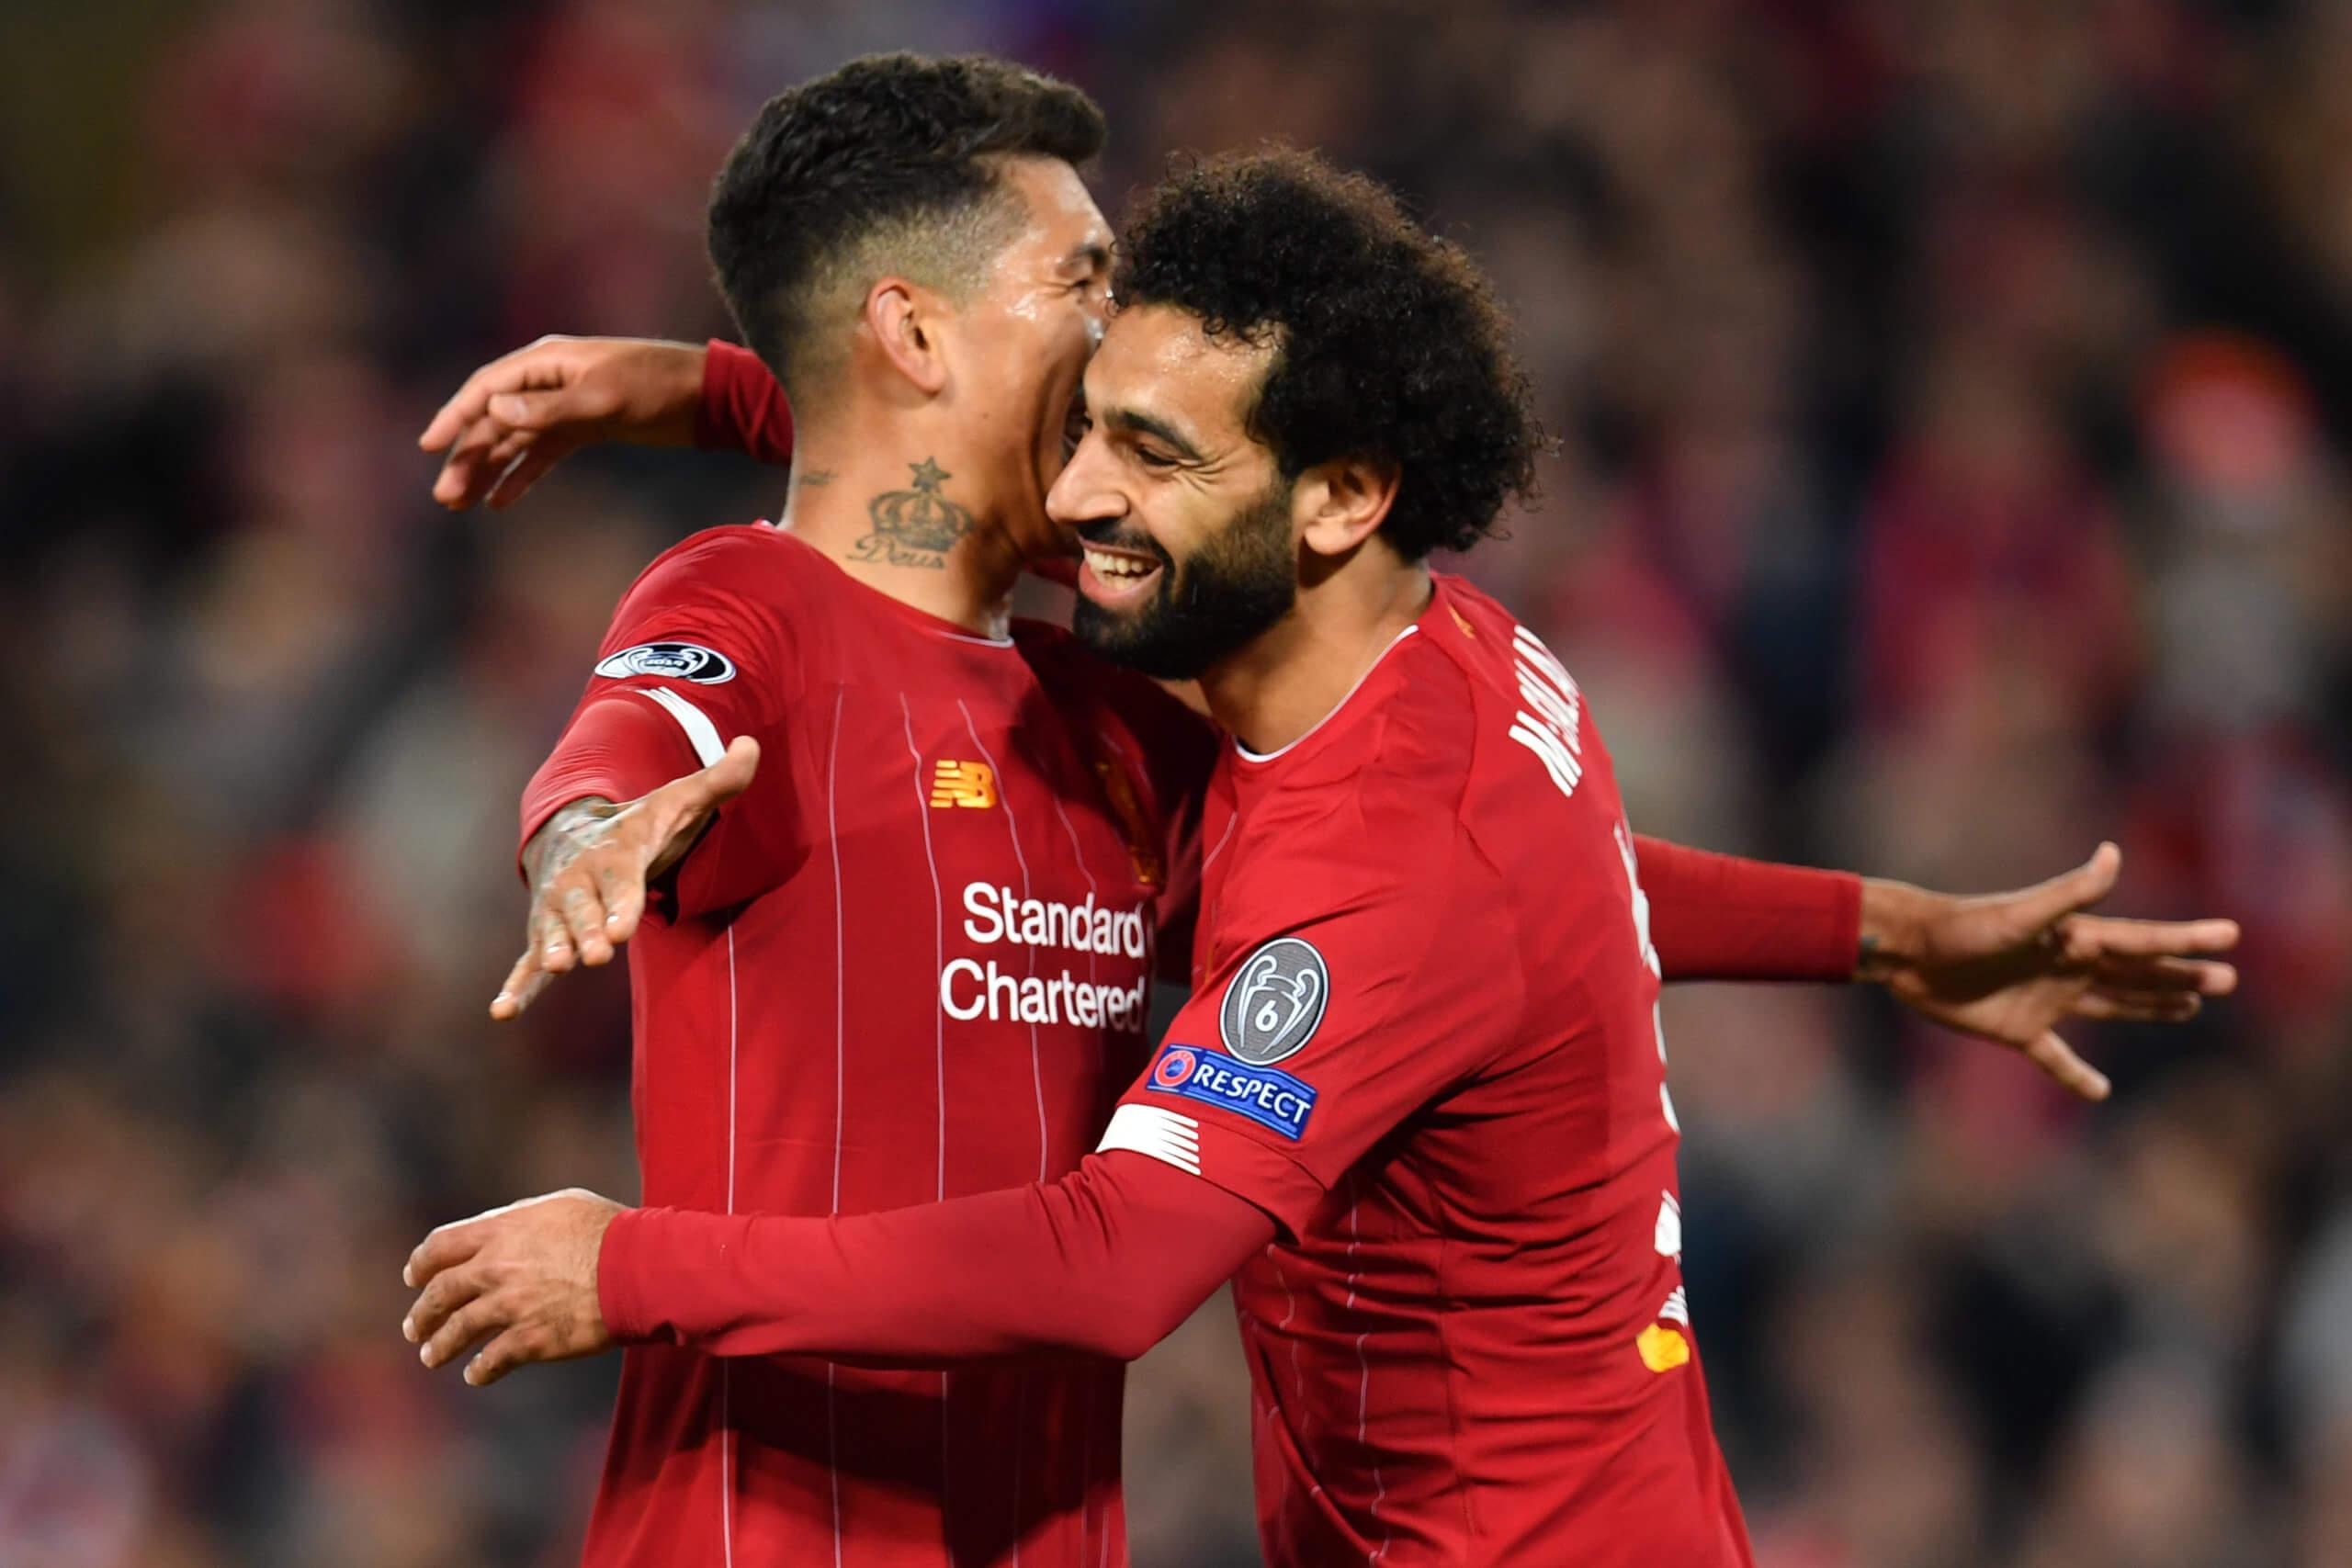 Premier League | Liverpool | Firmino & Salah